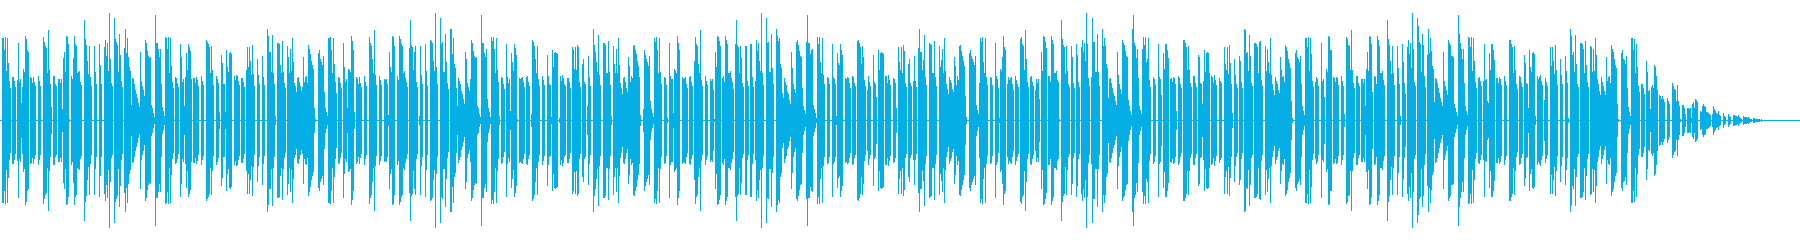 NES 汎用 B02-1(ステージ) の再生済みの波形